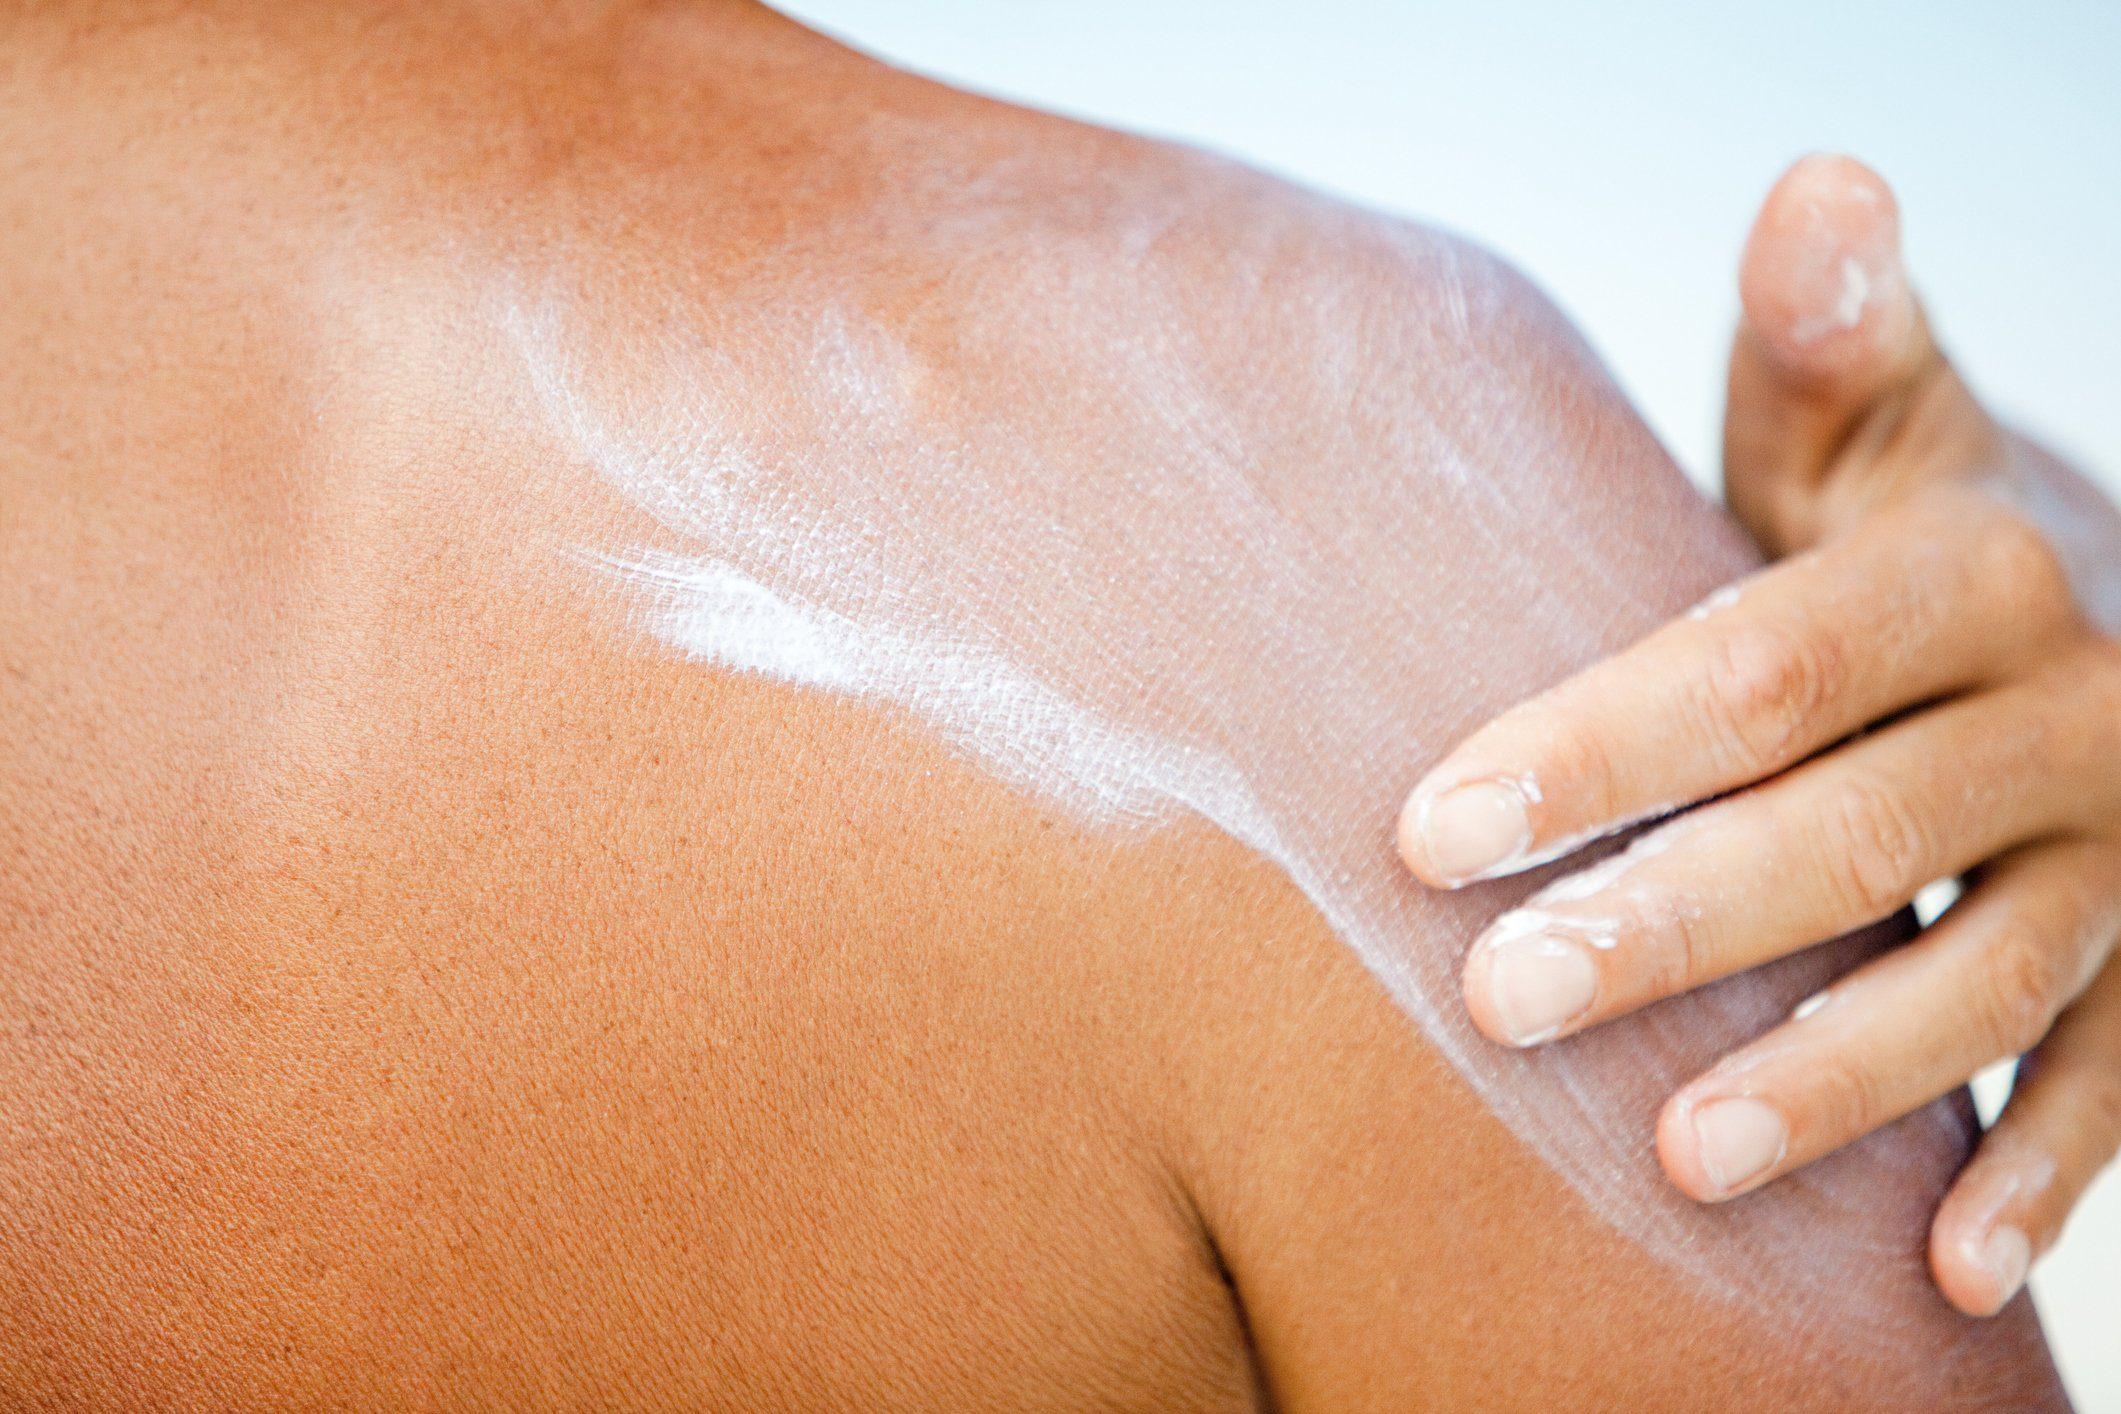 Woman applying sunscreen, Maldives